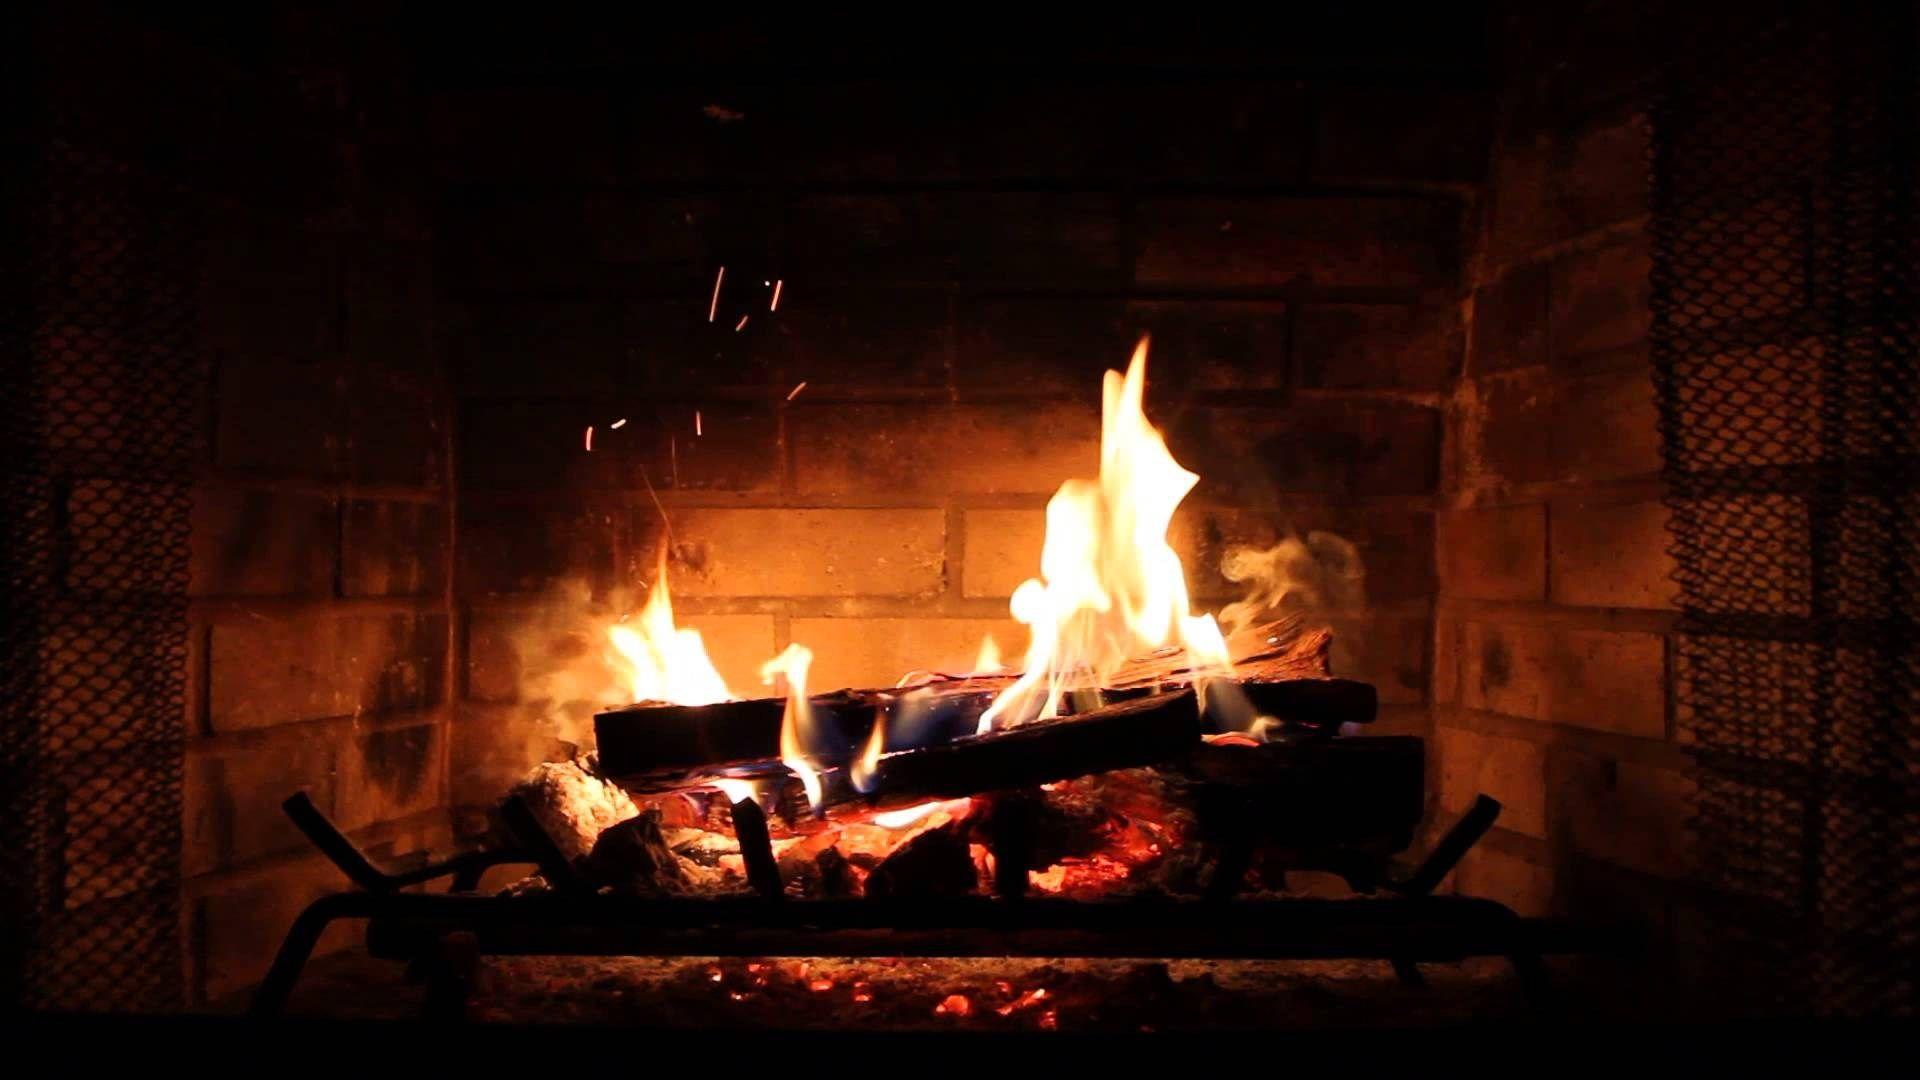 hd fireplace wallpaper Cozy fireplace, Desktop wallpaper